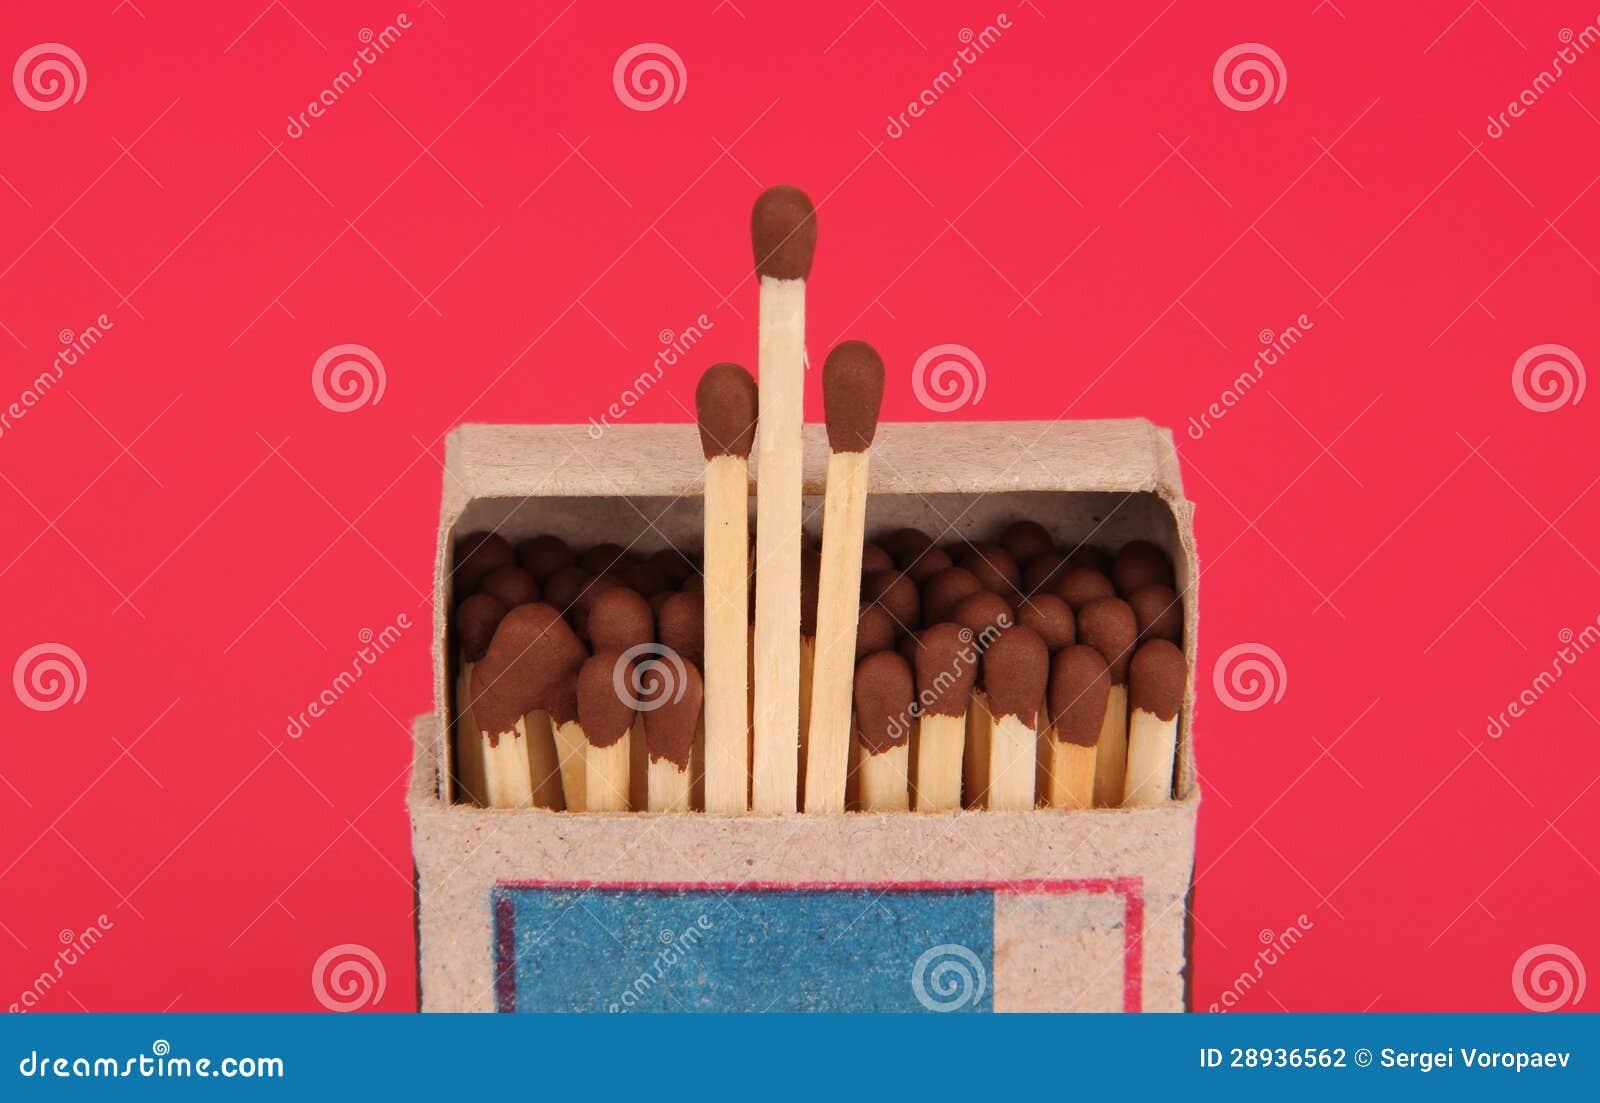 Box of matches.